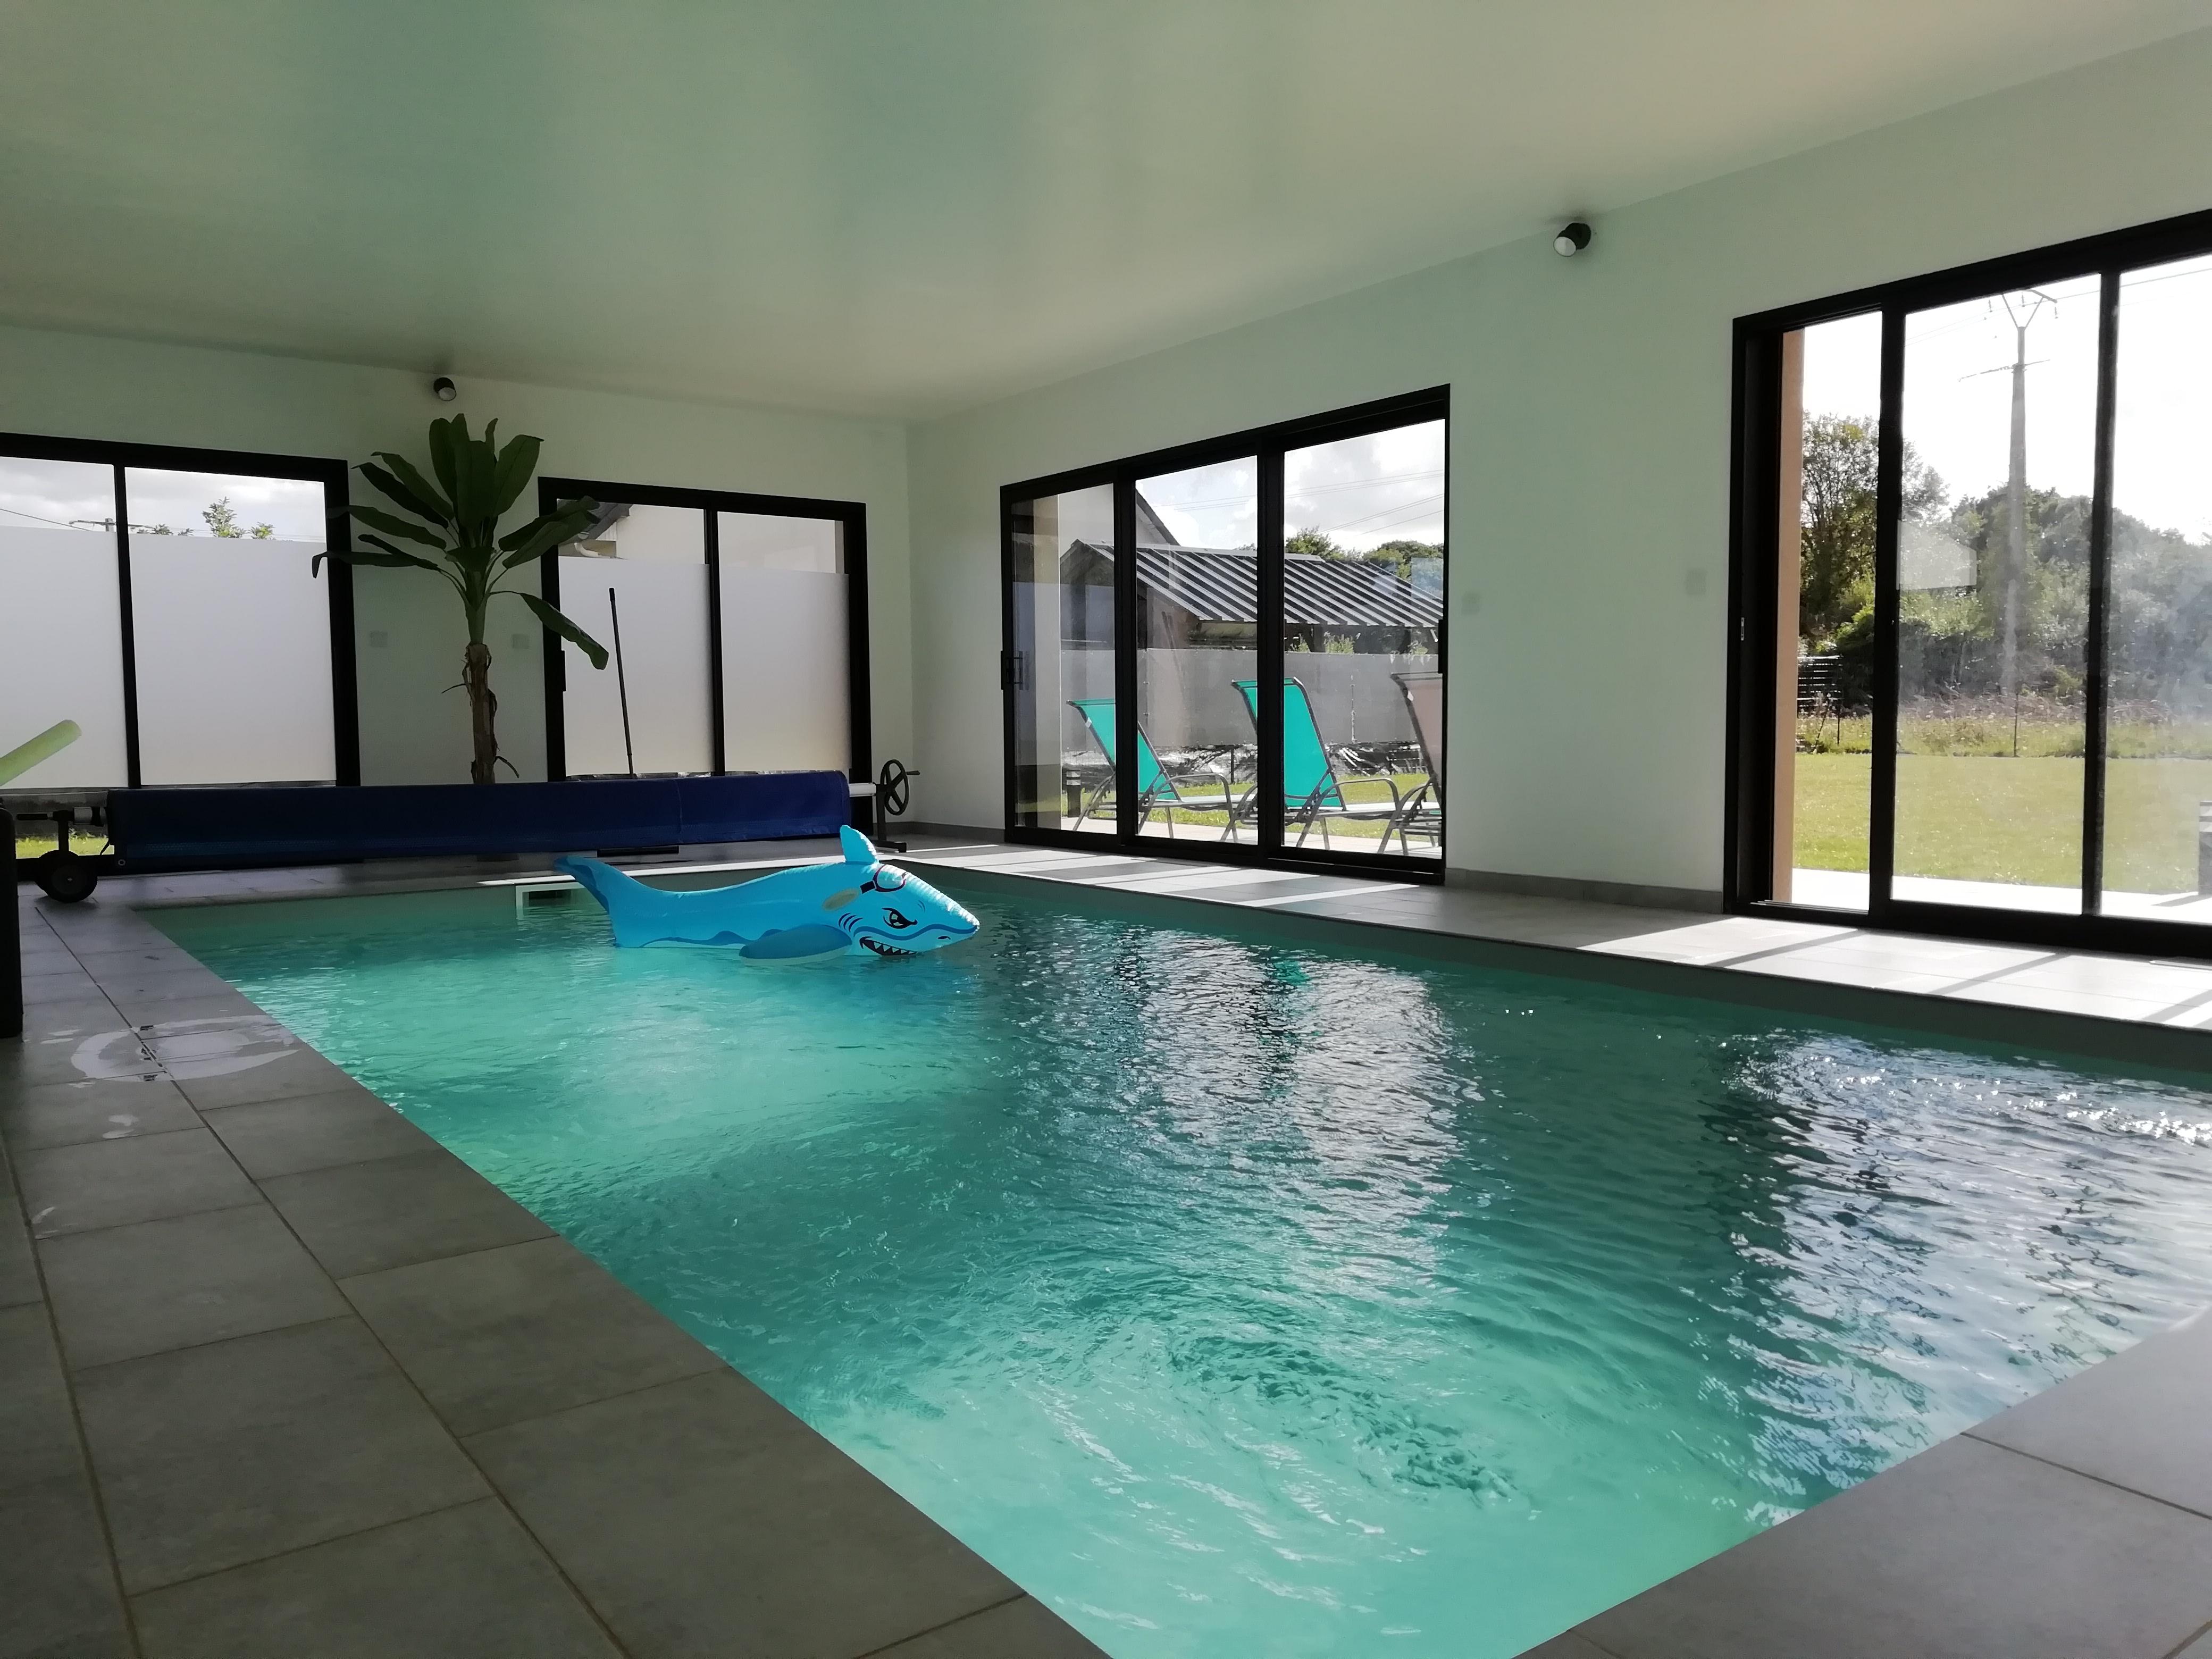 Villa Lantic Avec Piscine Interieure Chauffee 28 Villas For Rent In Lantic Bretagne France